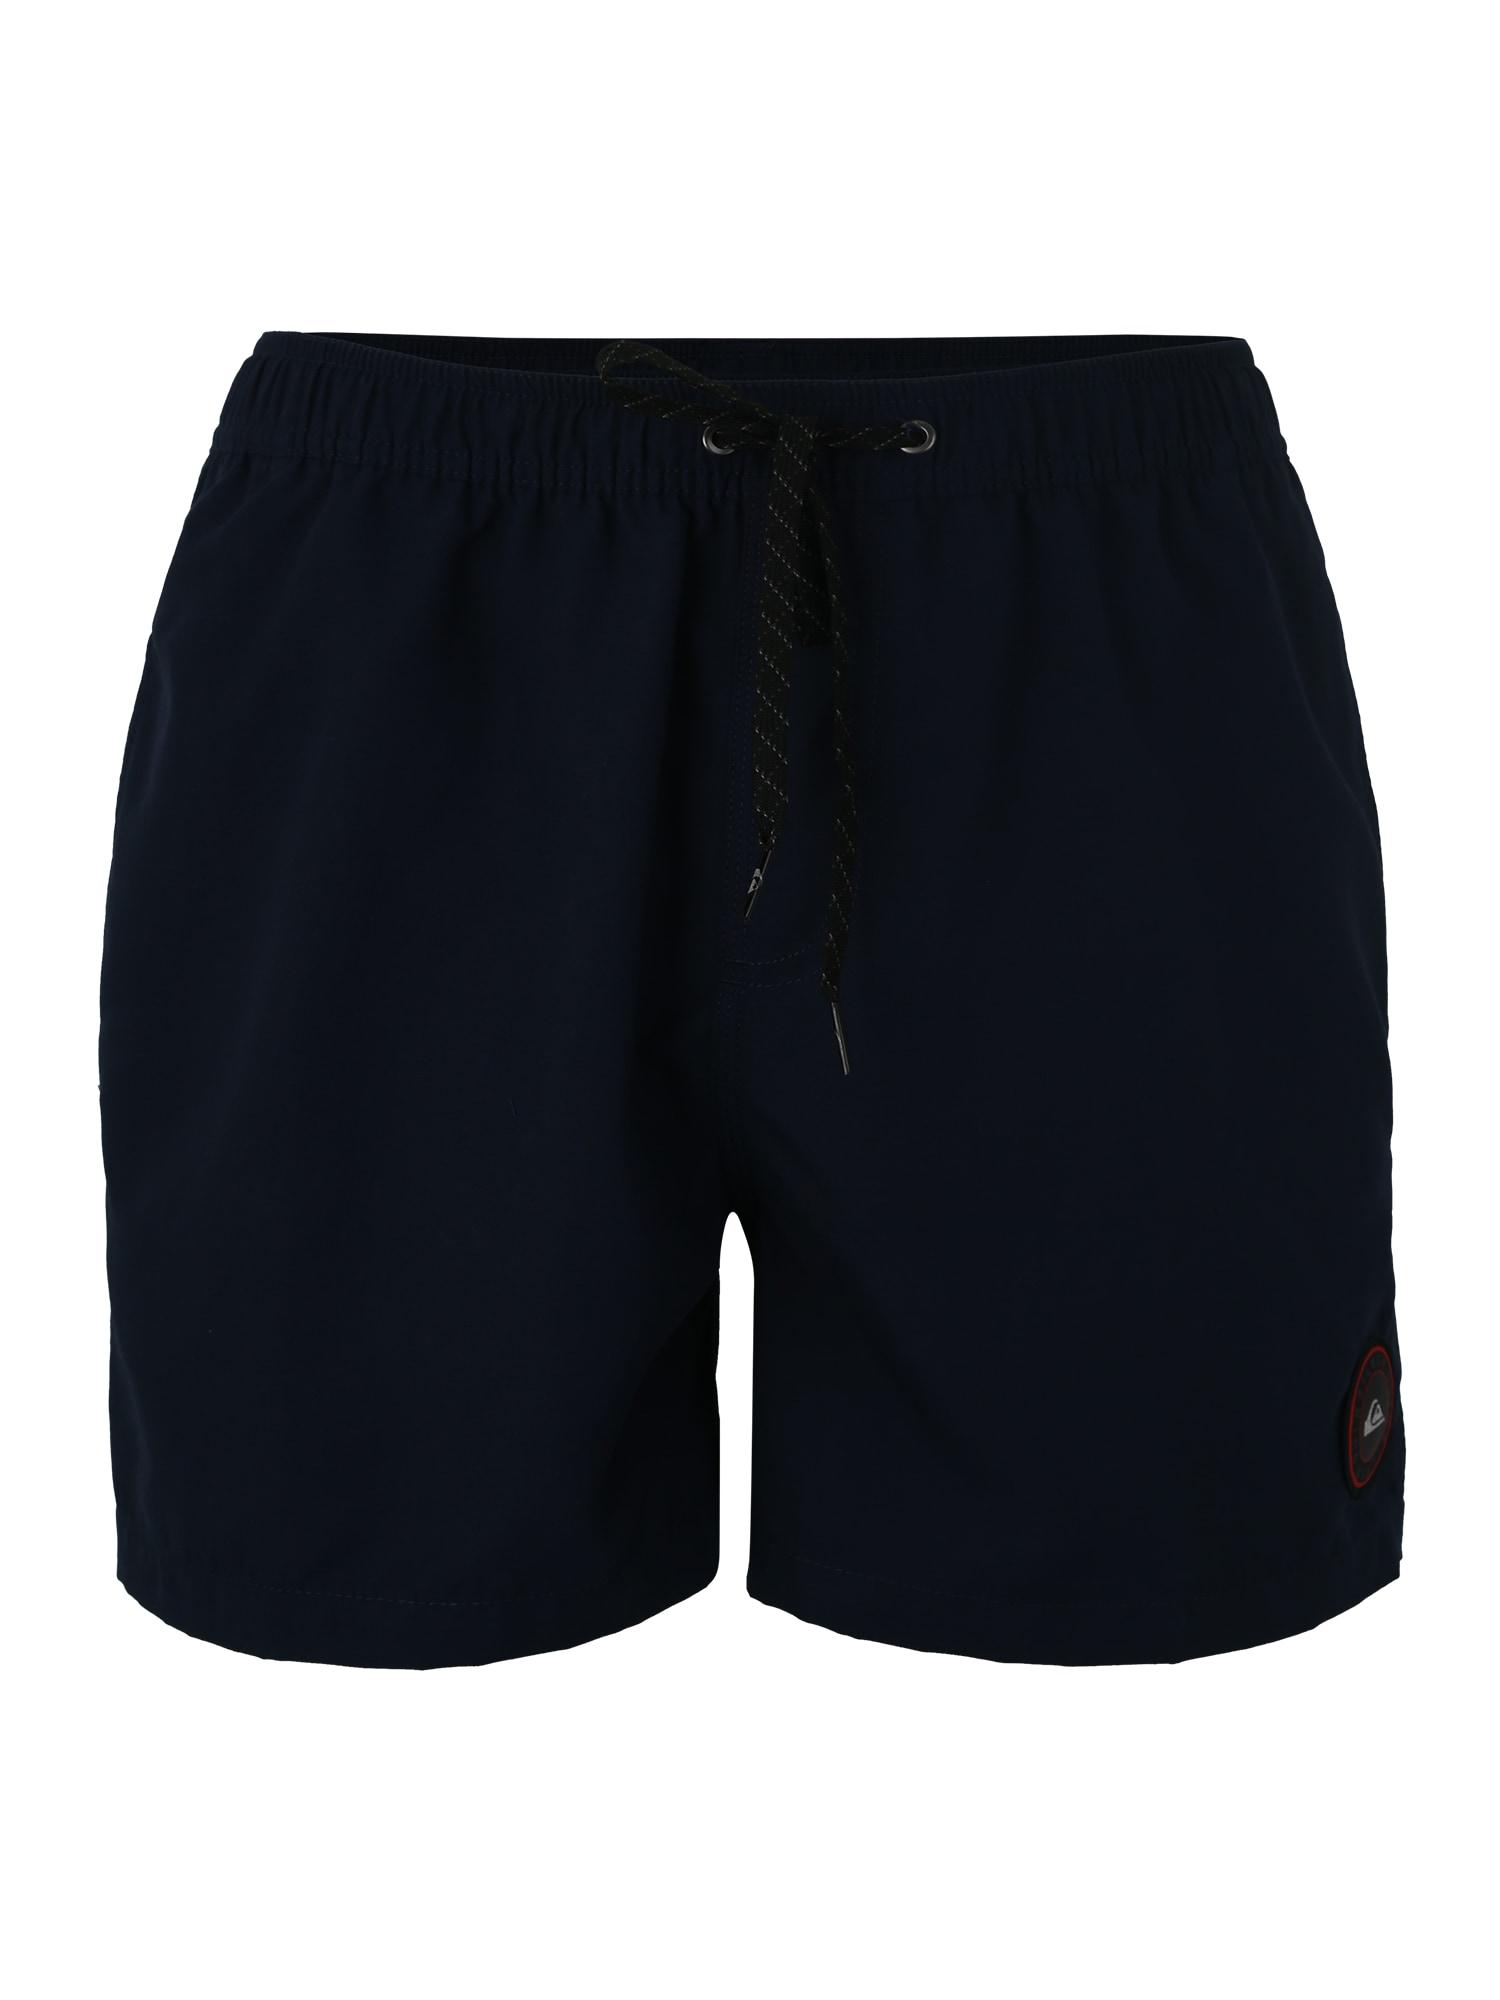 Plavecké šortky Everyday 15 Volley tmavě modrá QUIKSILVER